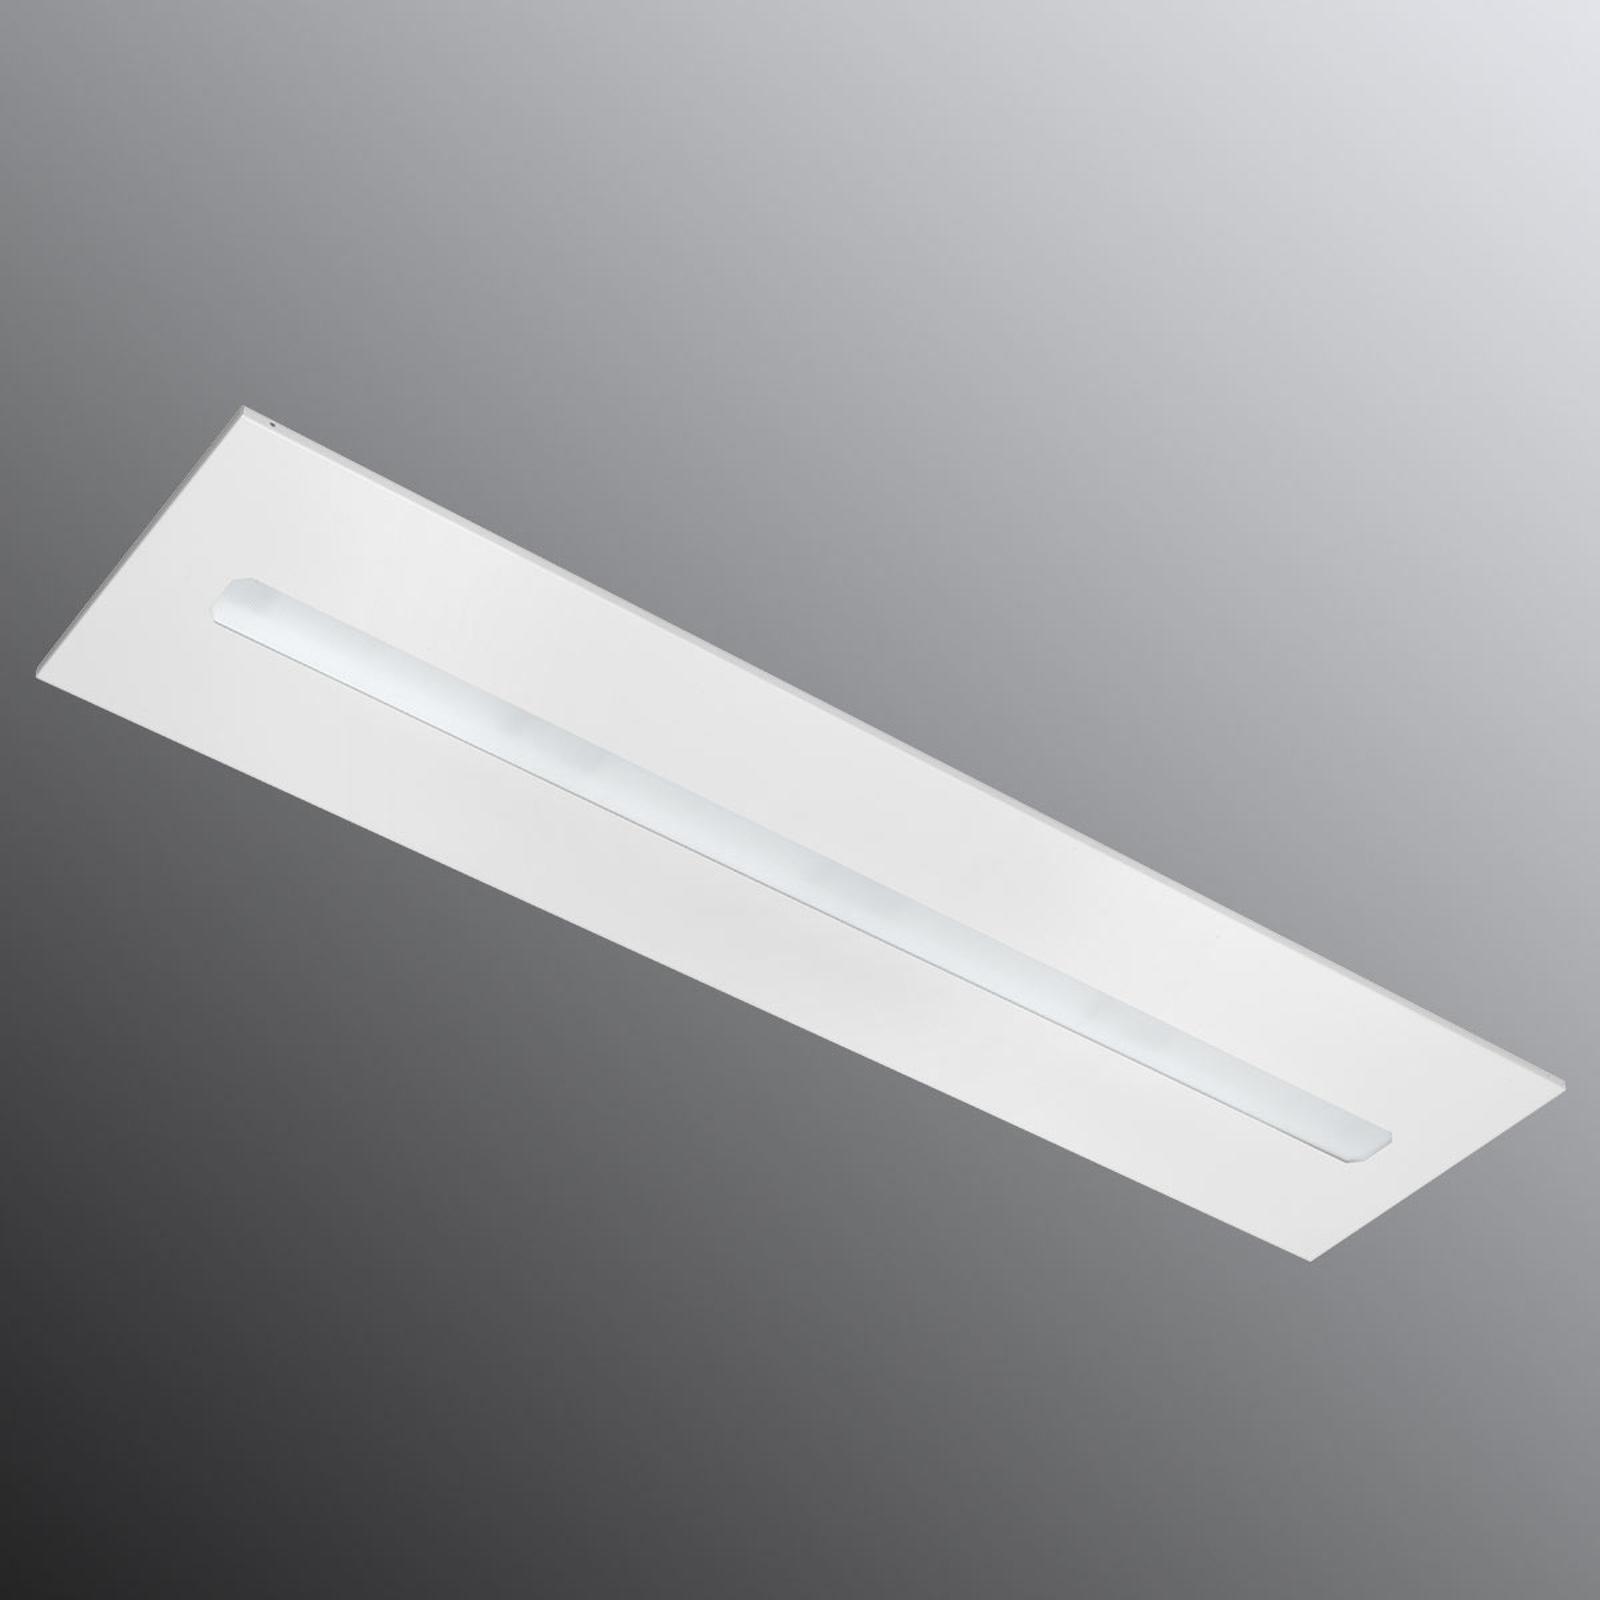 Freyn II Recessed LED-Panel 124,5 x 31cm 3.000K